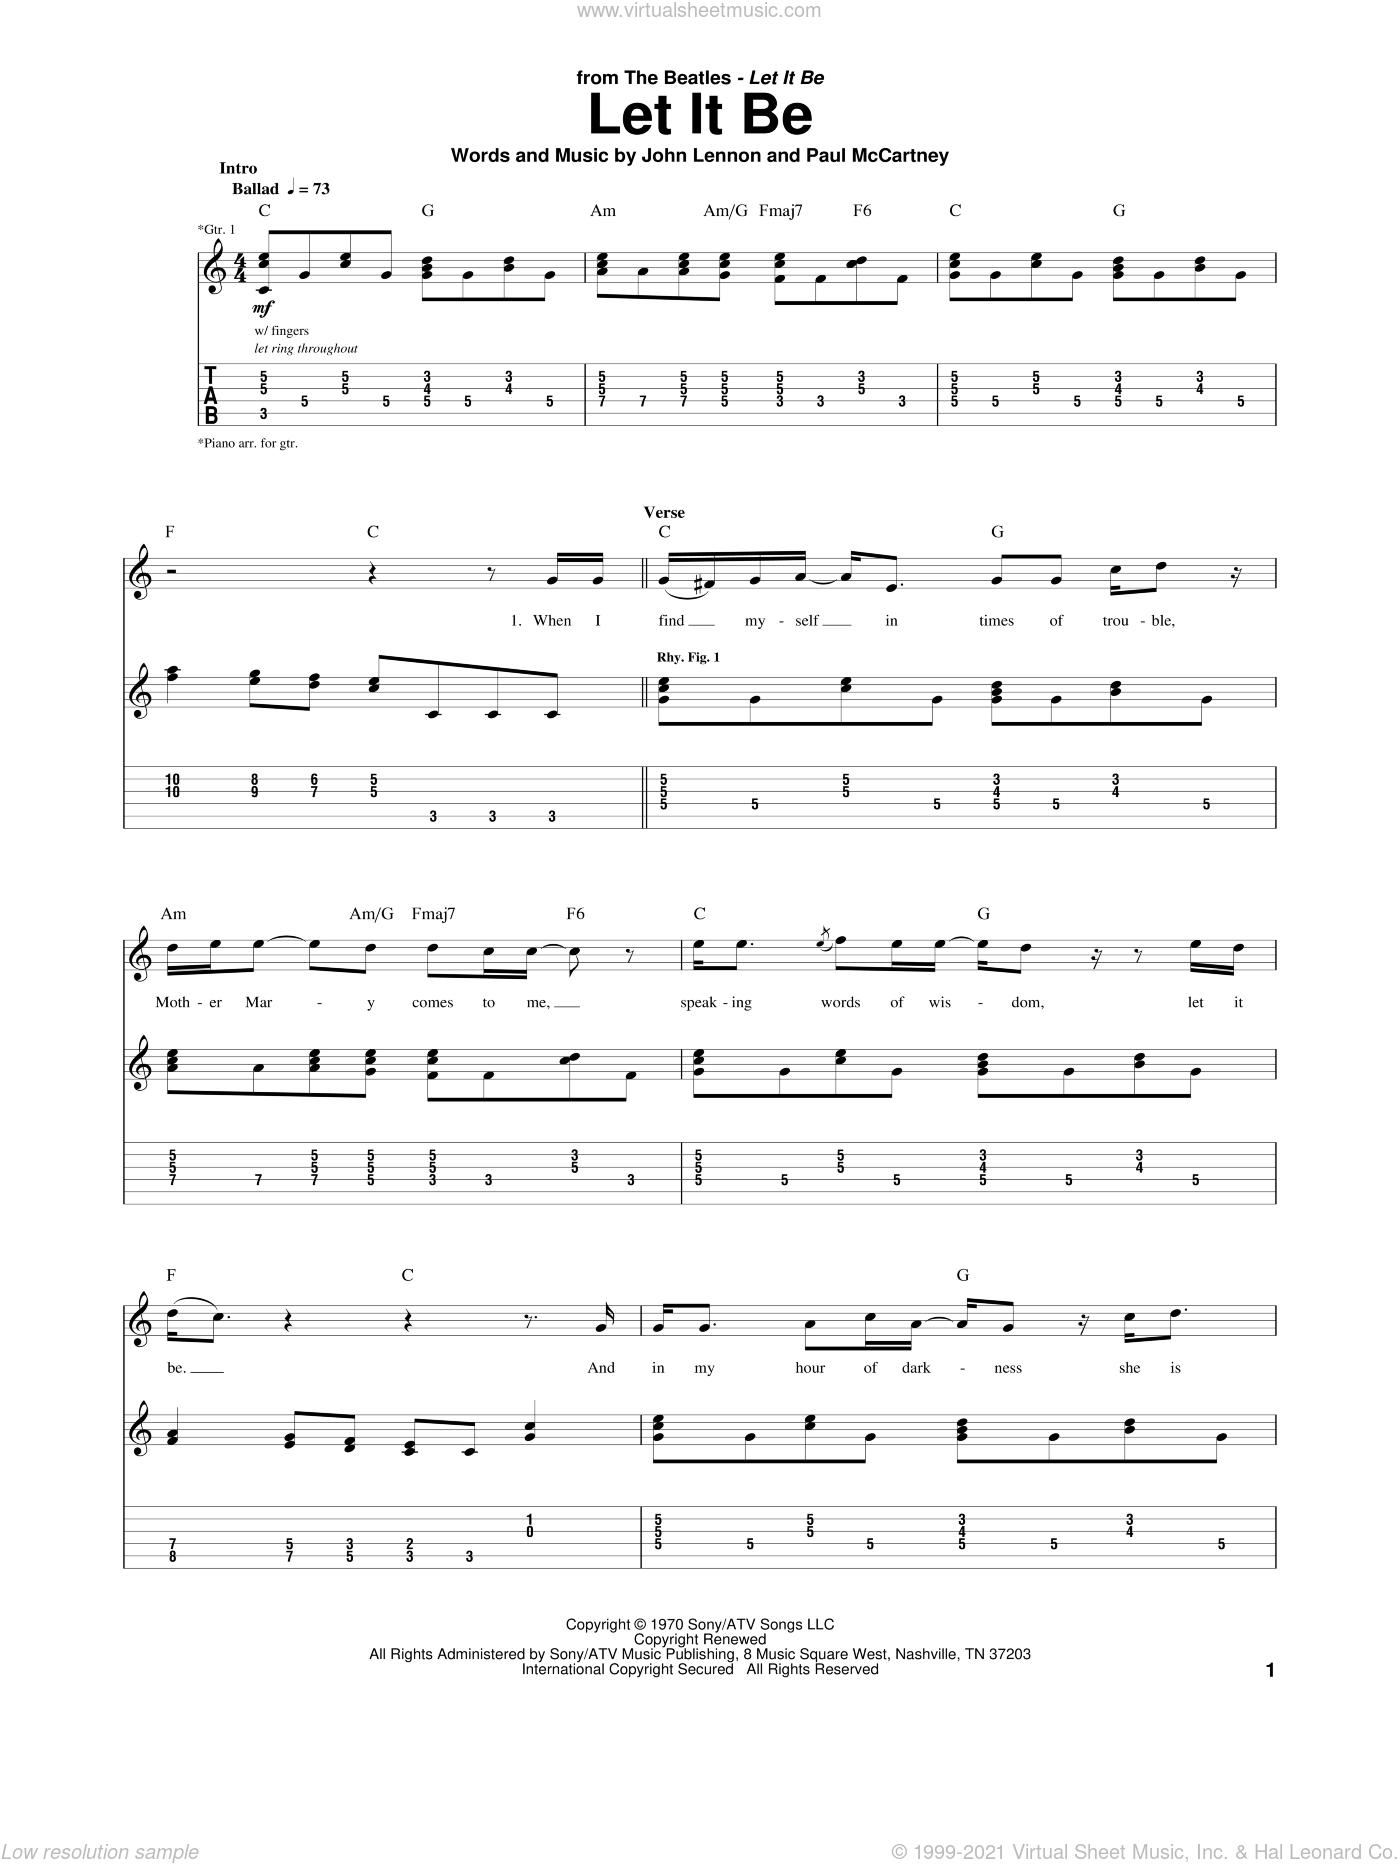 Let It Be sheet music for guitar (tablature) by The Beatles, John Lennon and Paul McCartney, intermediate skill level